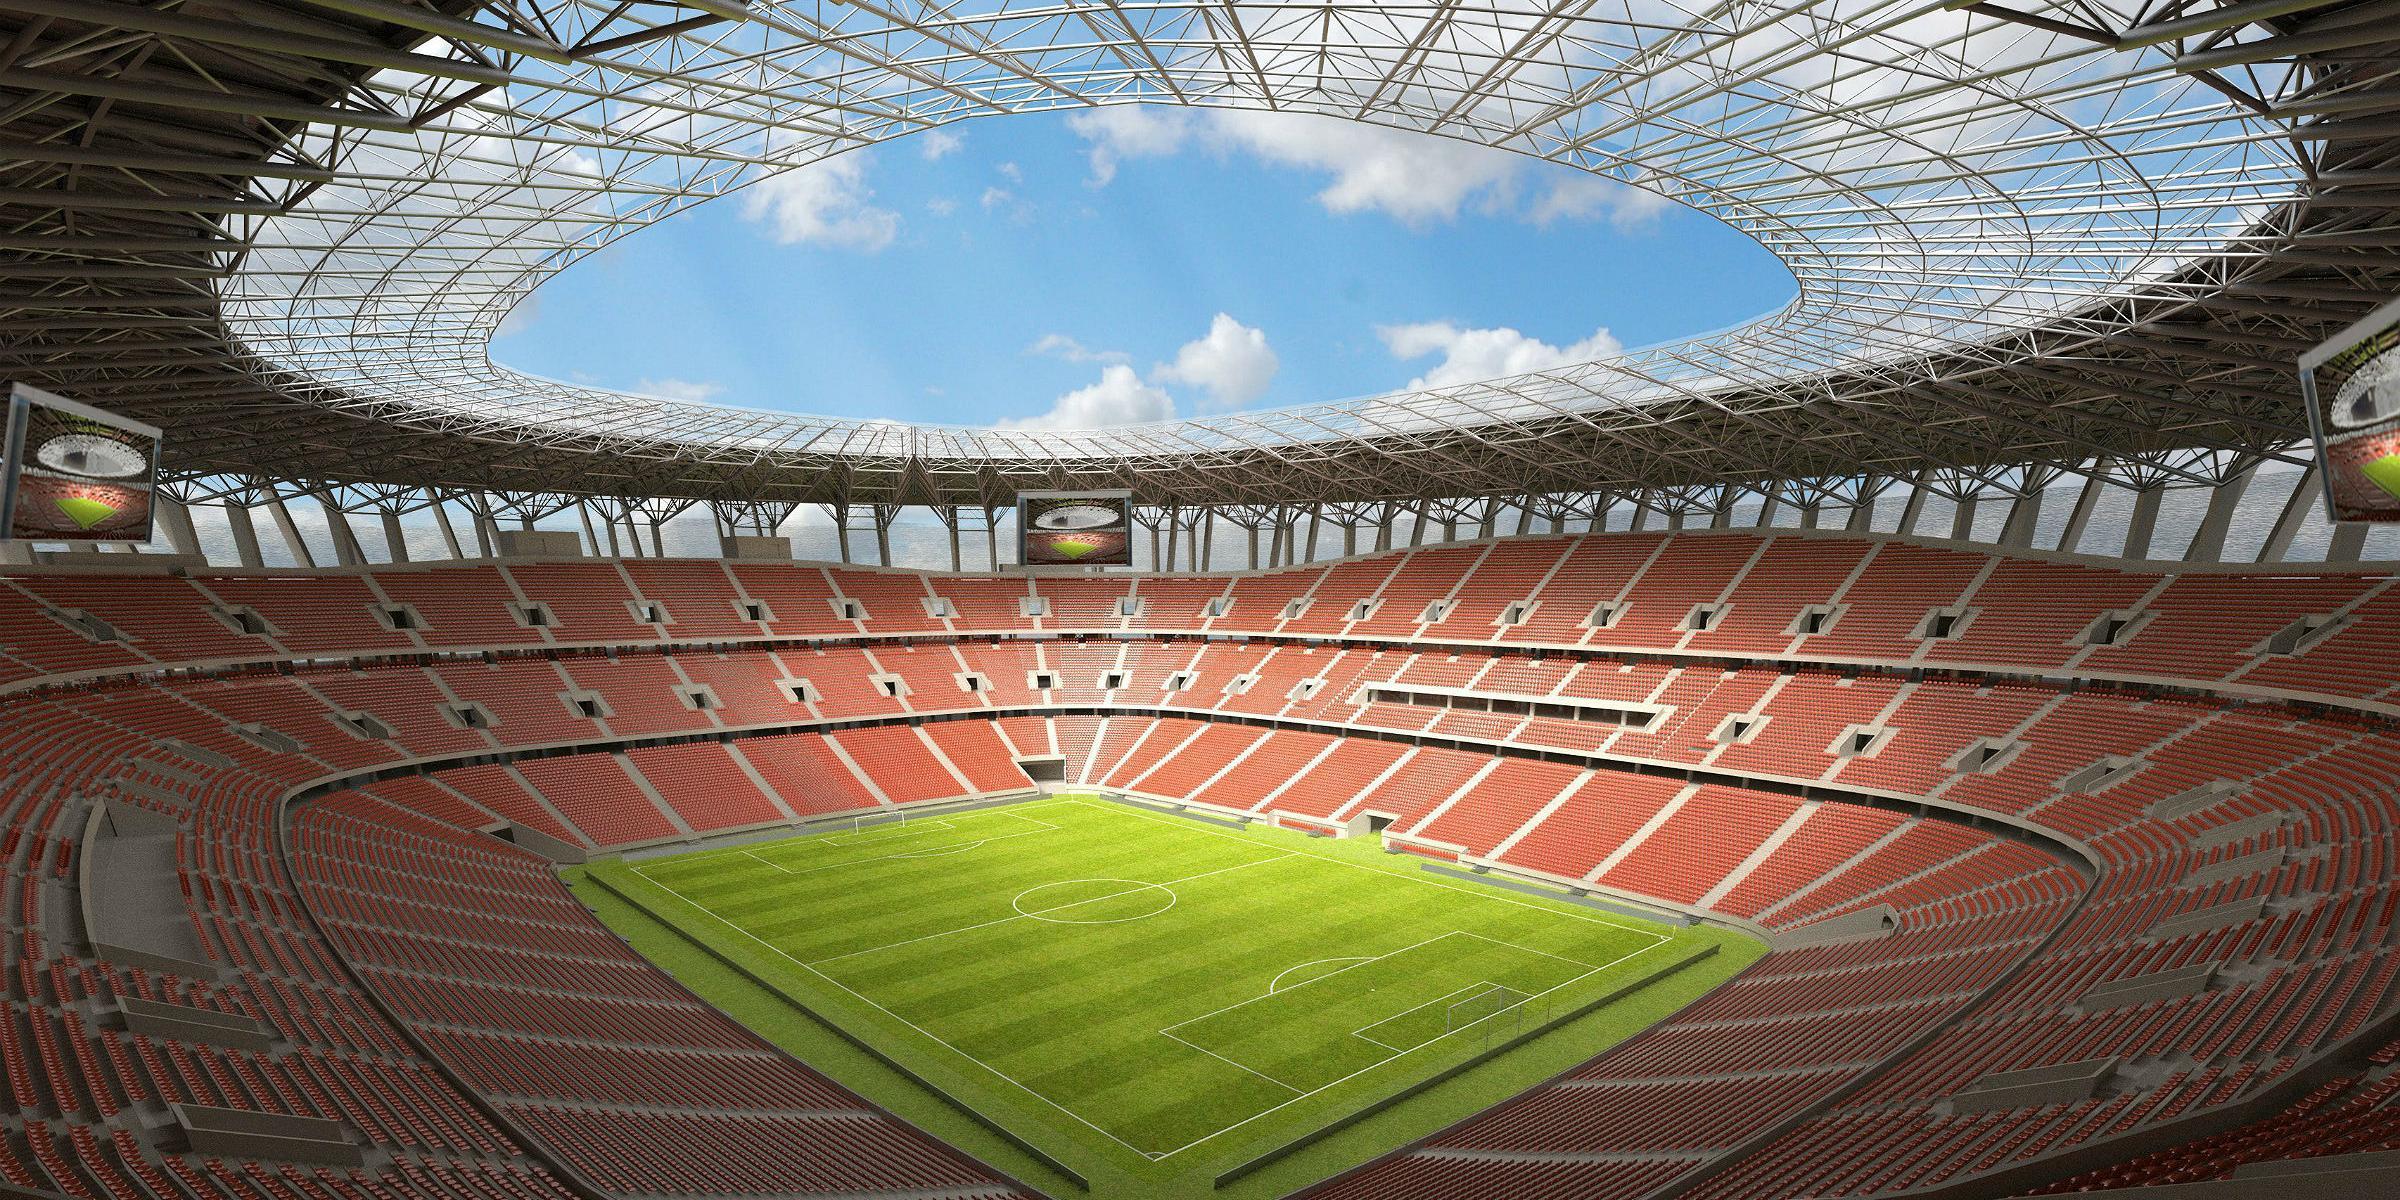 20150602az-uj-puskas-ferenc-stadion1.jpg